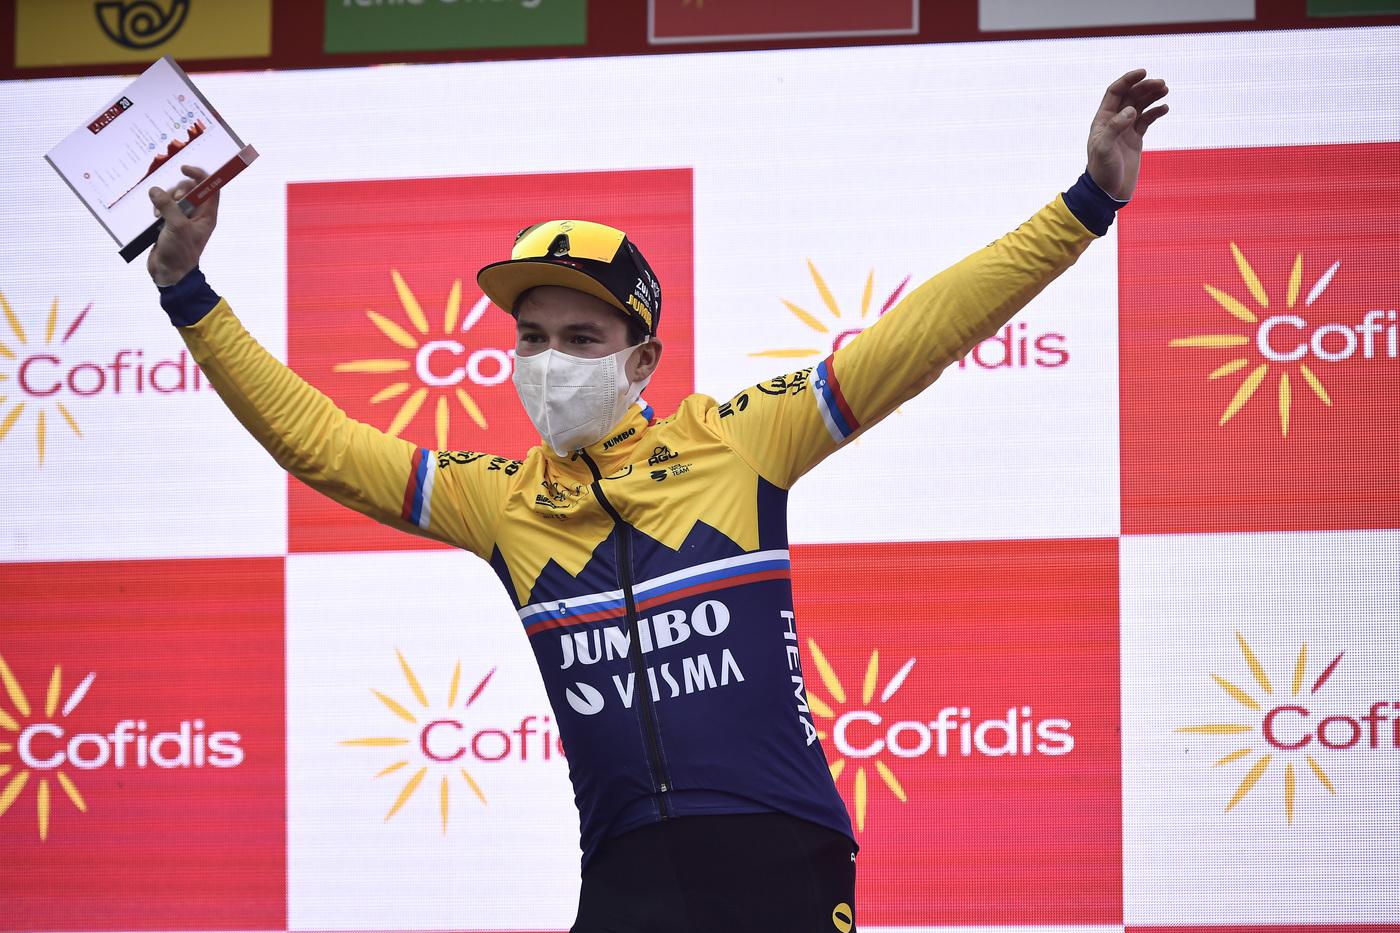 VIDEO Vuelta a España 2020, highlights tappa di oggi: Roglic vince in salita, battuto Carapaz